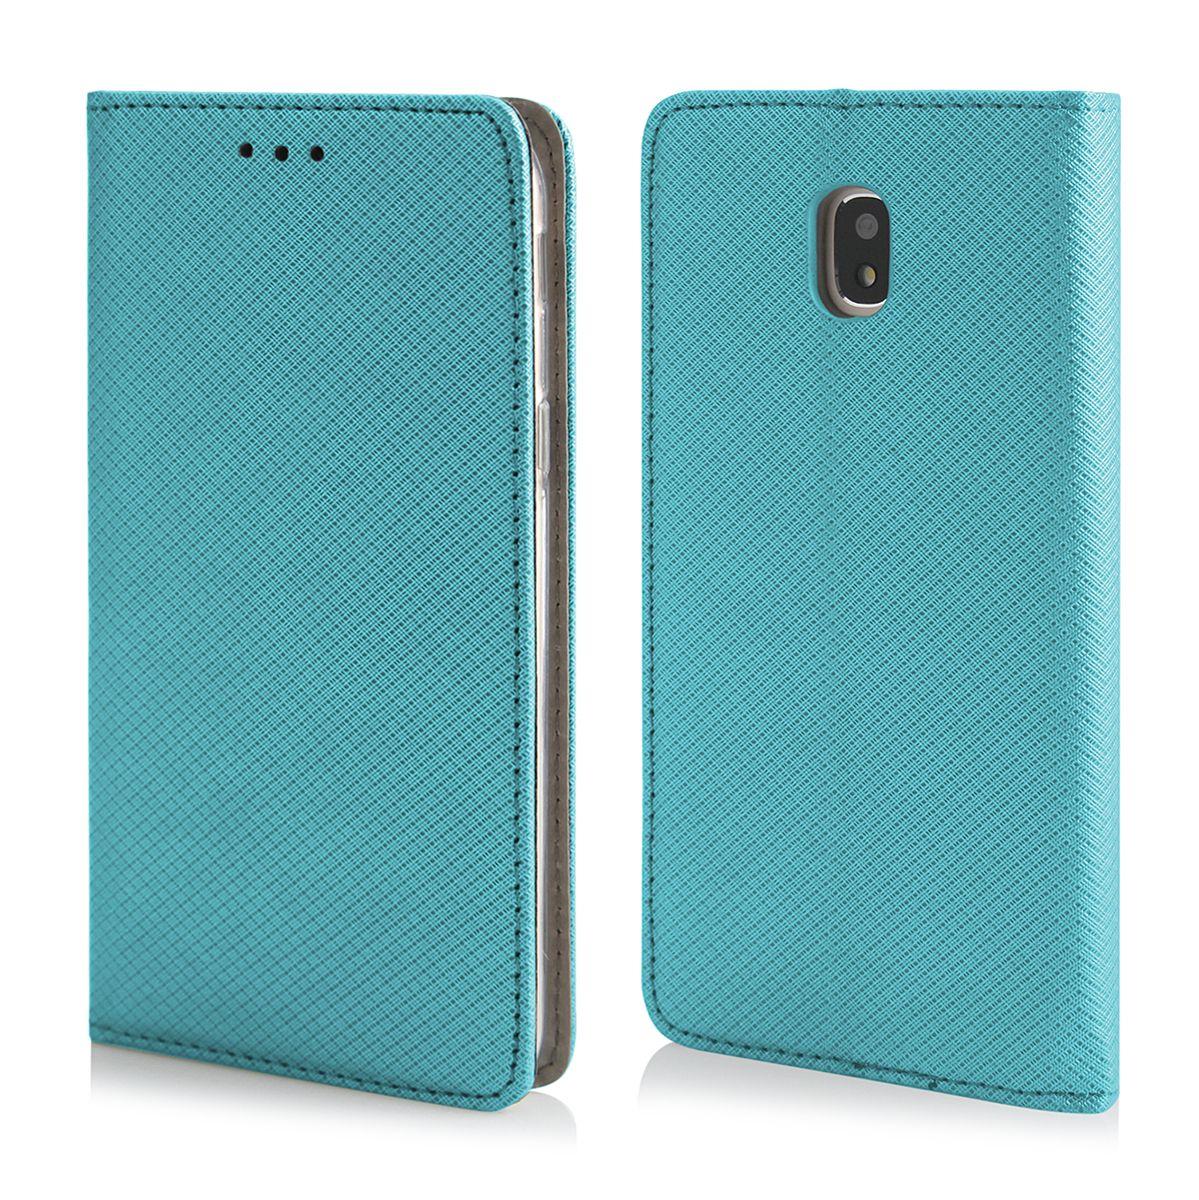 Pouzdro Sligo Smart pro Samsung J6 Plus - Magnet - tyrkysové Sligo Case